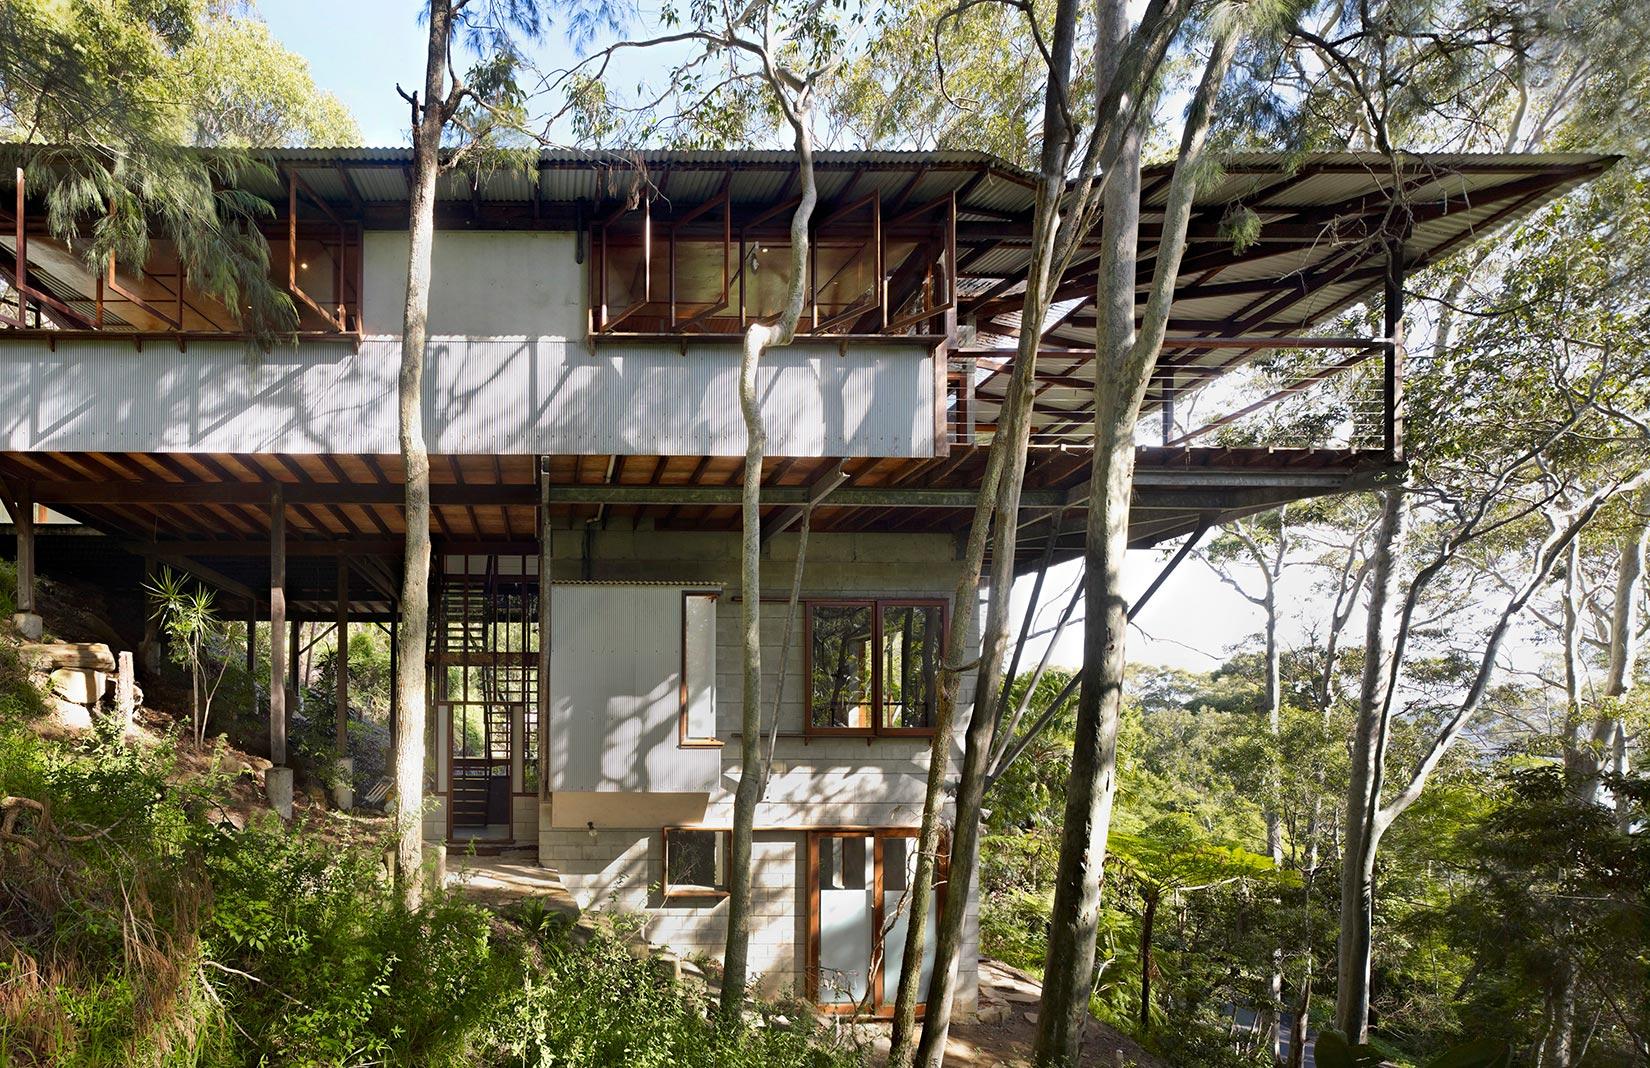 Awesome Treetop House #4: Treetop House By Peter Stutchbury